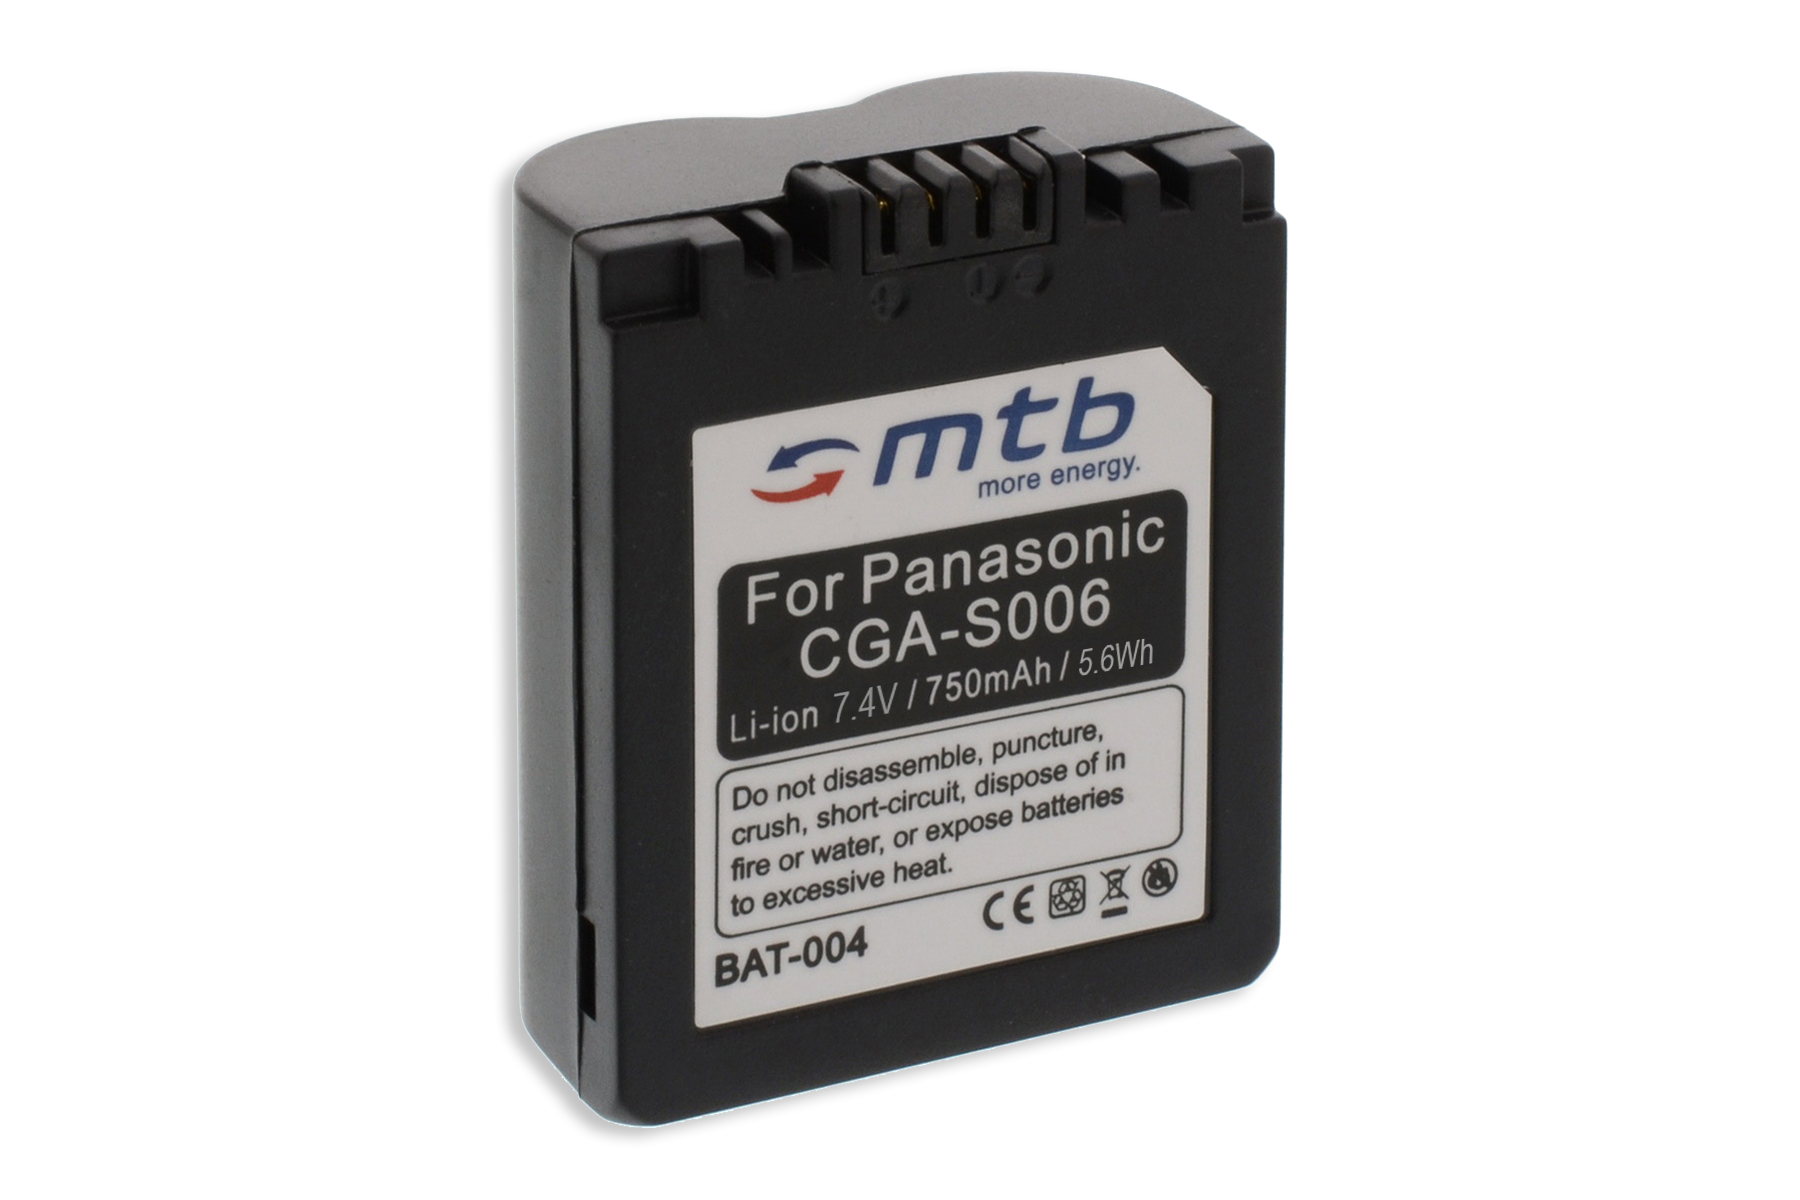 Top-Akku-fuer-Panasonic-Lumix-DMC-FZ38-FZ50-CGR-S006A-CGR-S006-E-DMW-BMA7